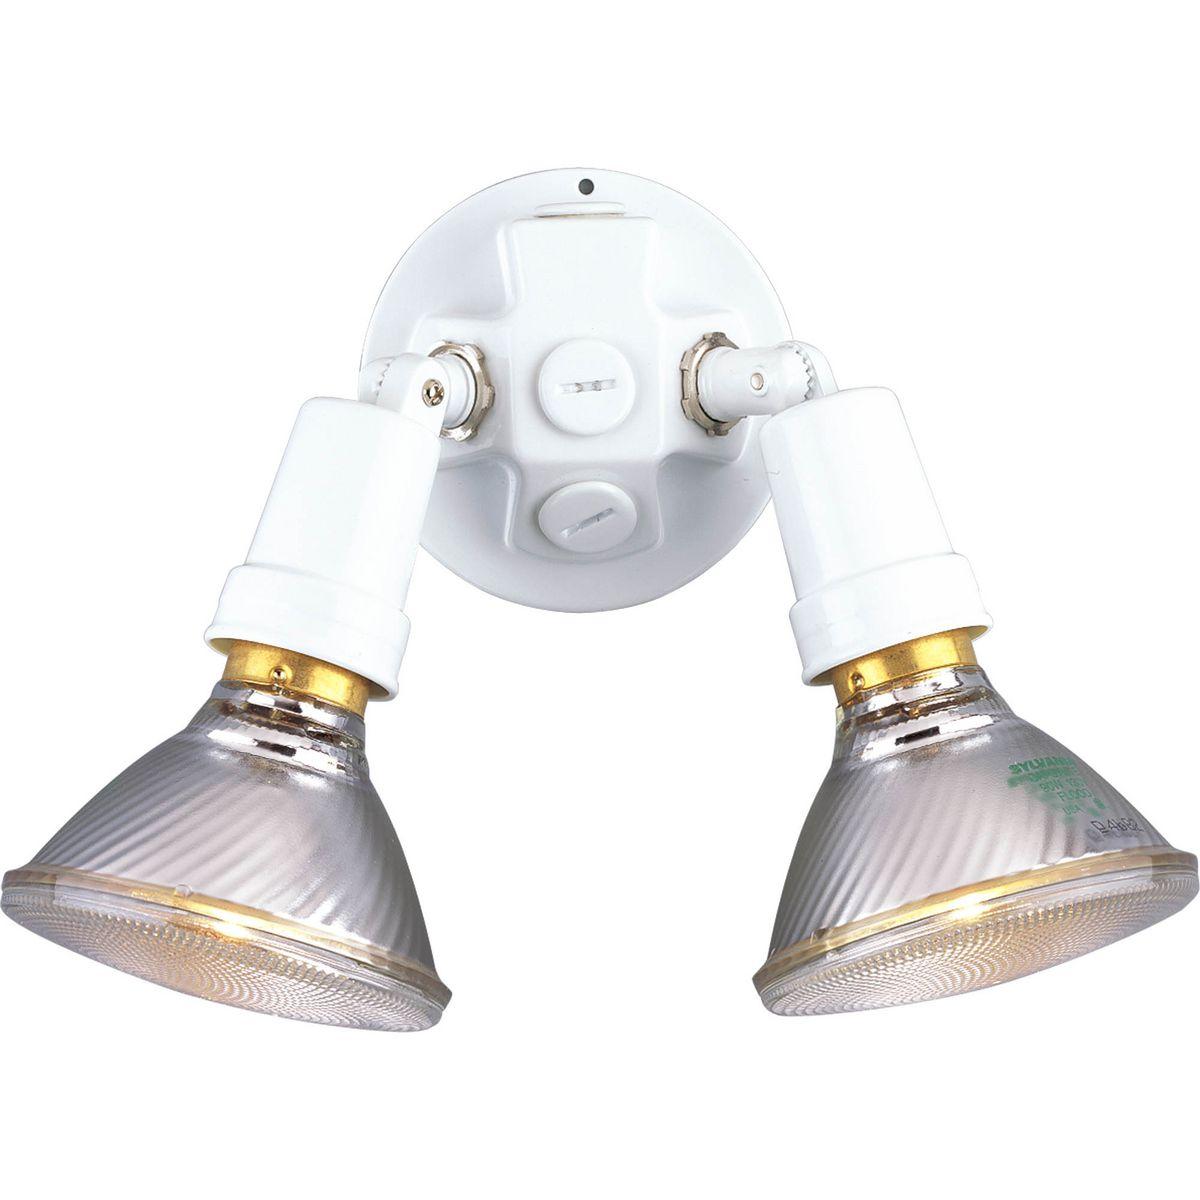 PRO P5207-30 2X150M White Outdoor Flood Light